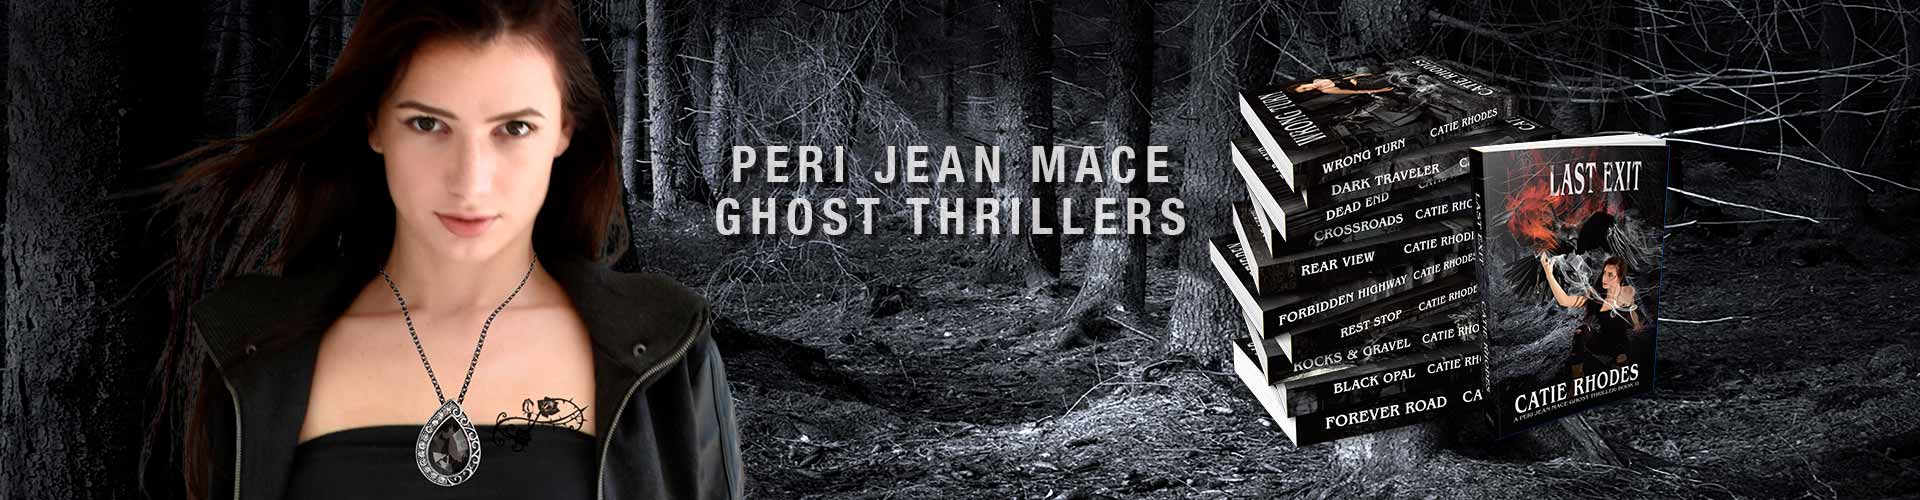 Peri Jean Mace Ghost Thrillers